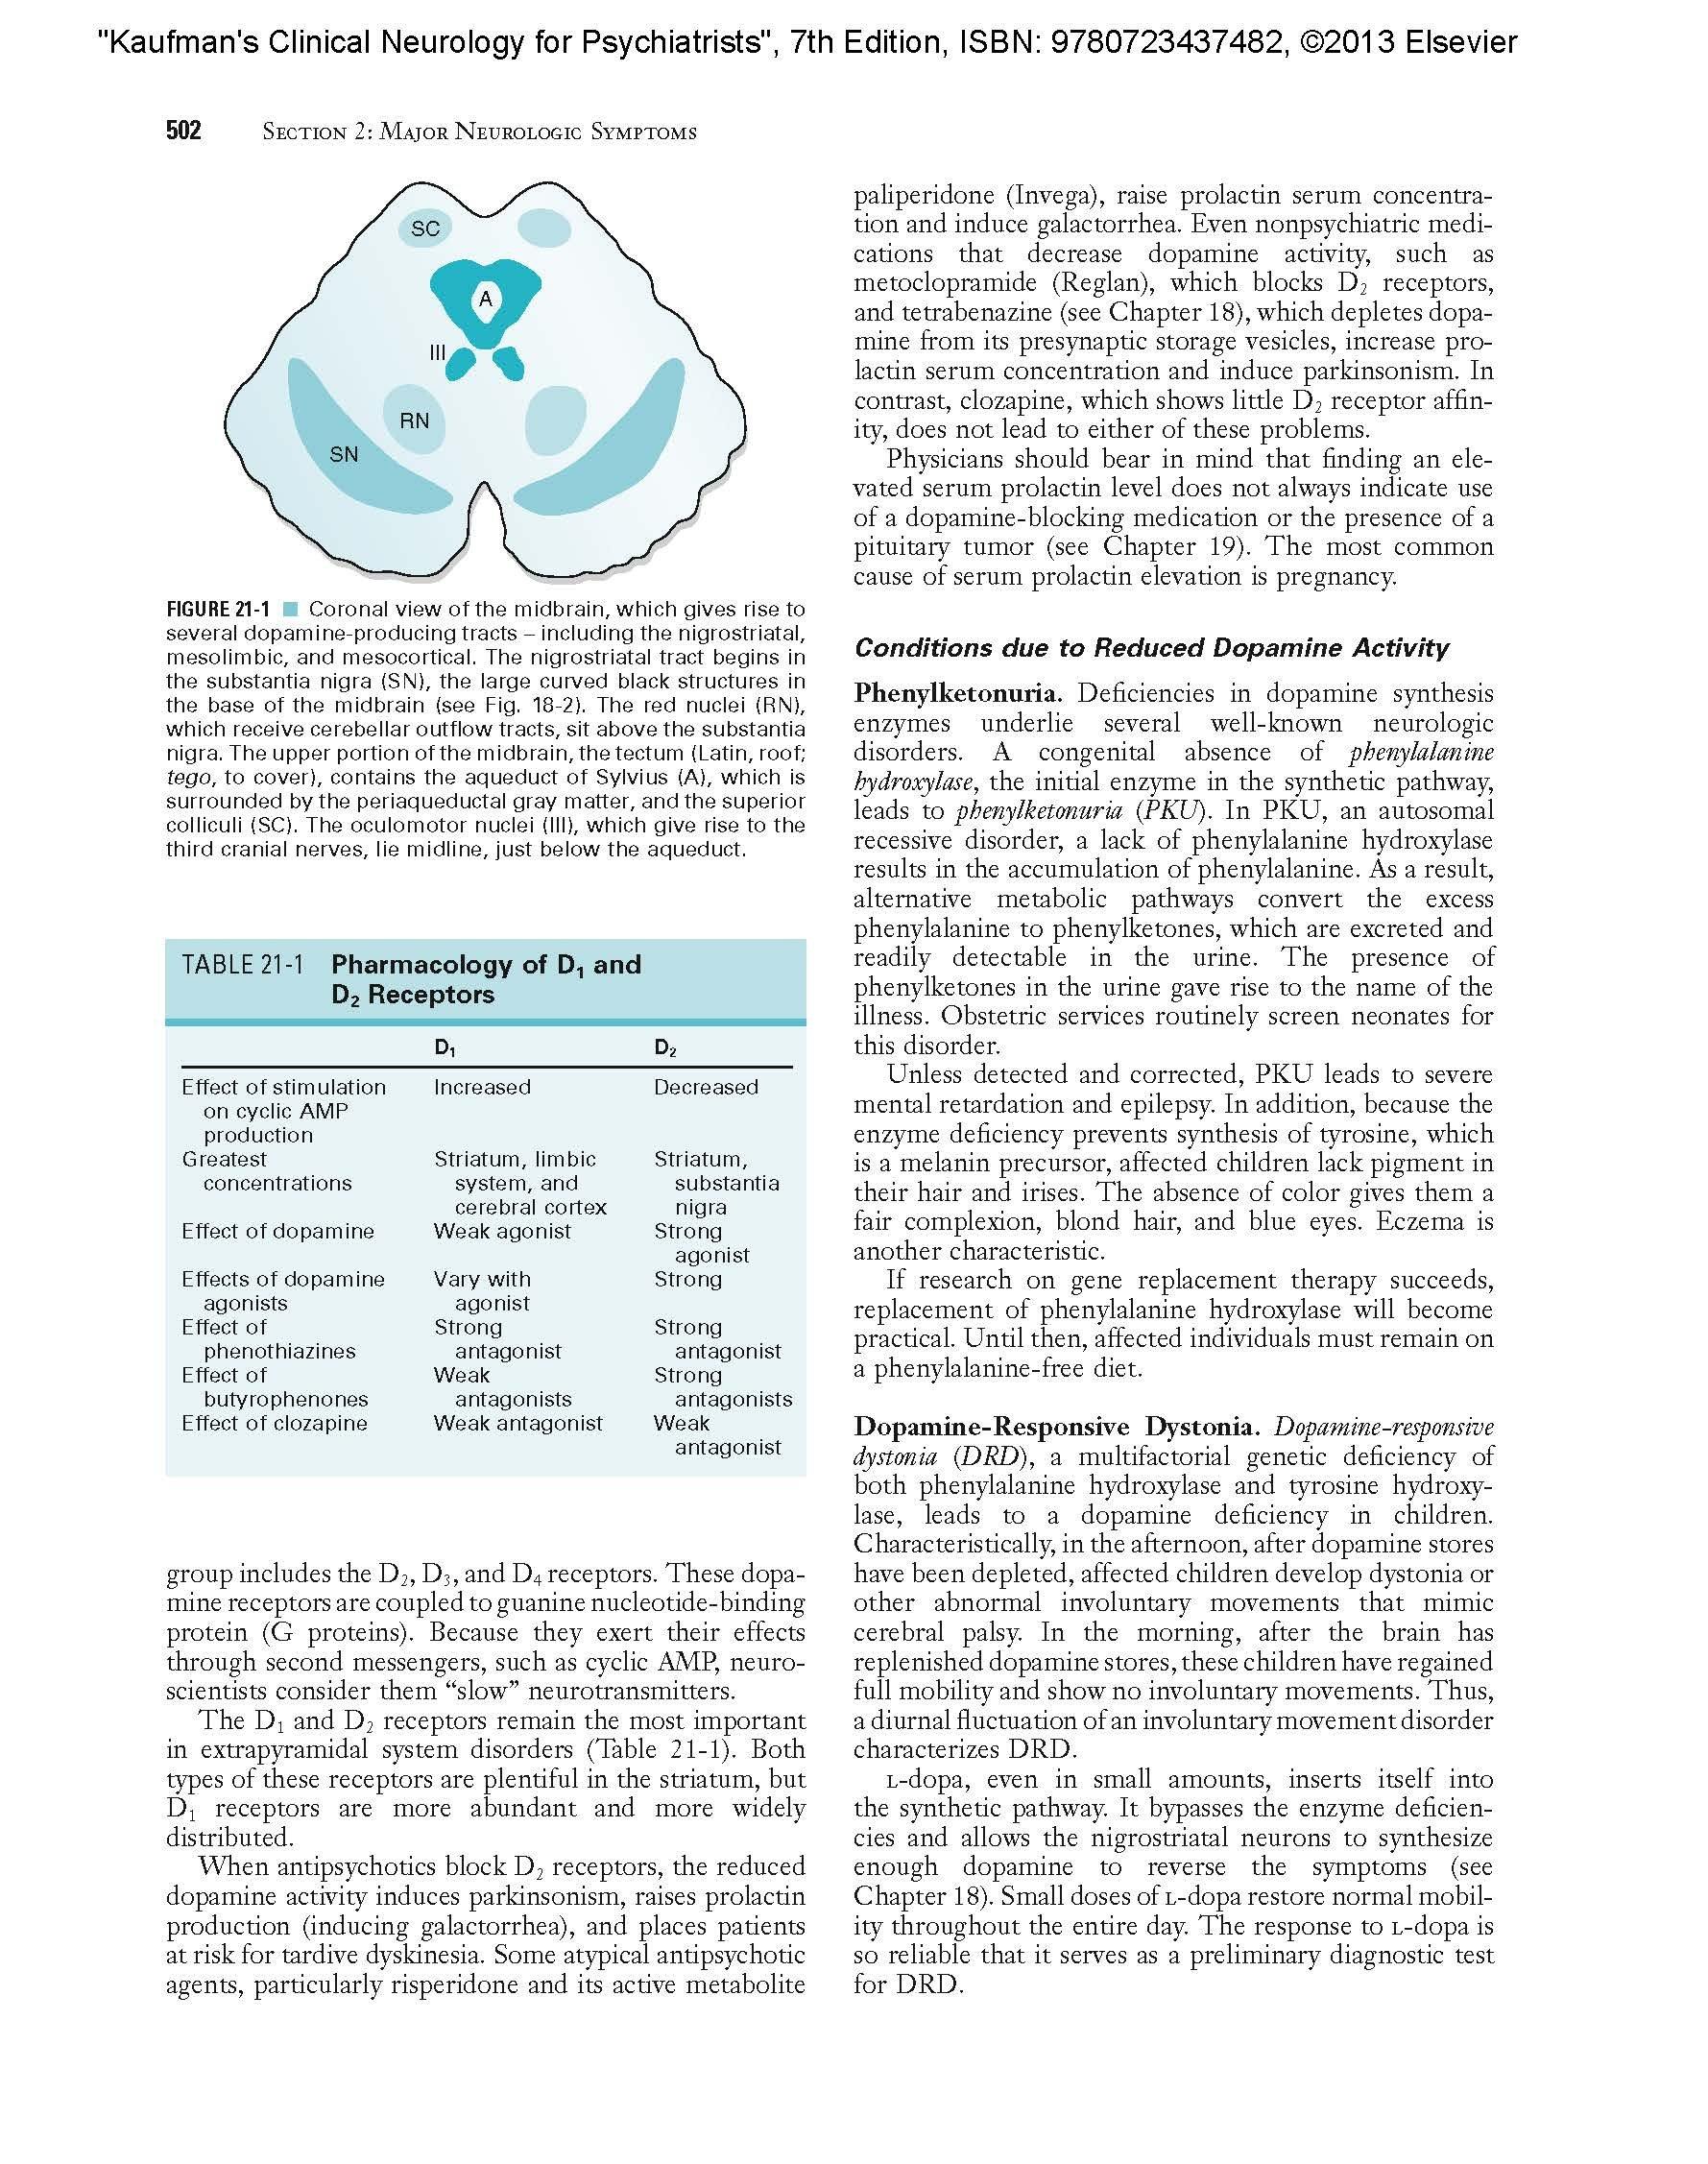 Kaufman's Clinical Neurology for Psychiatrists: Expert Consult: Online and  Print: David Myland Kaufman MD, Mark J Milstein MD: 9780723437482:  Psychiatry: ...